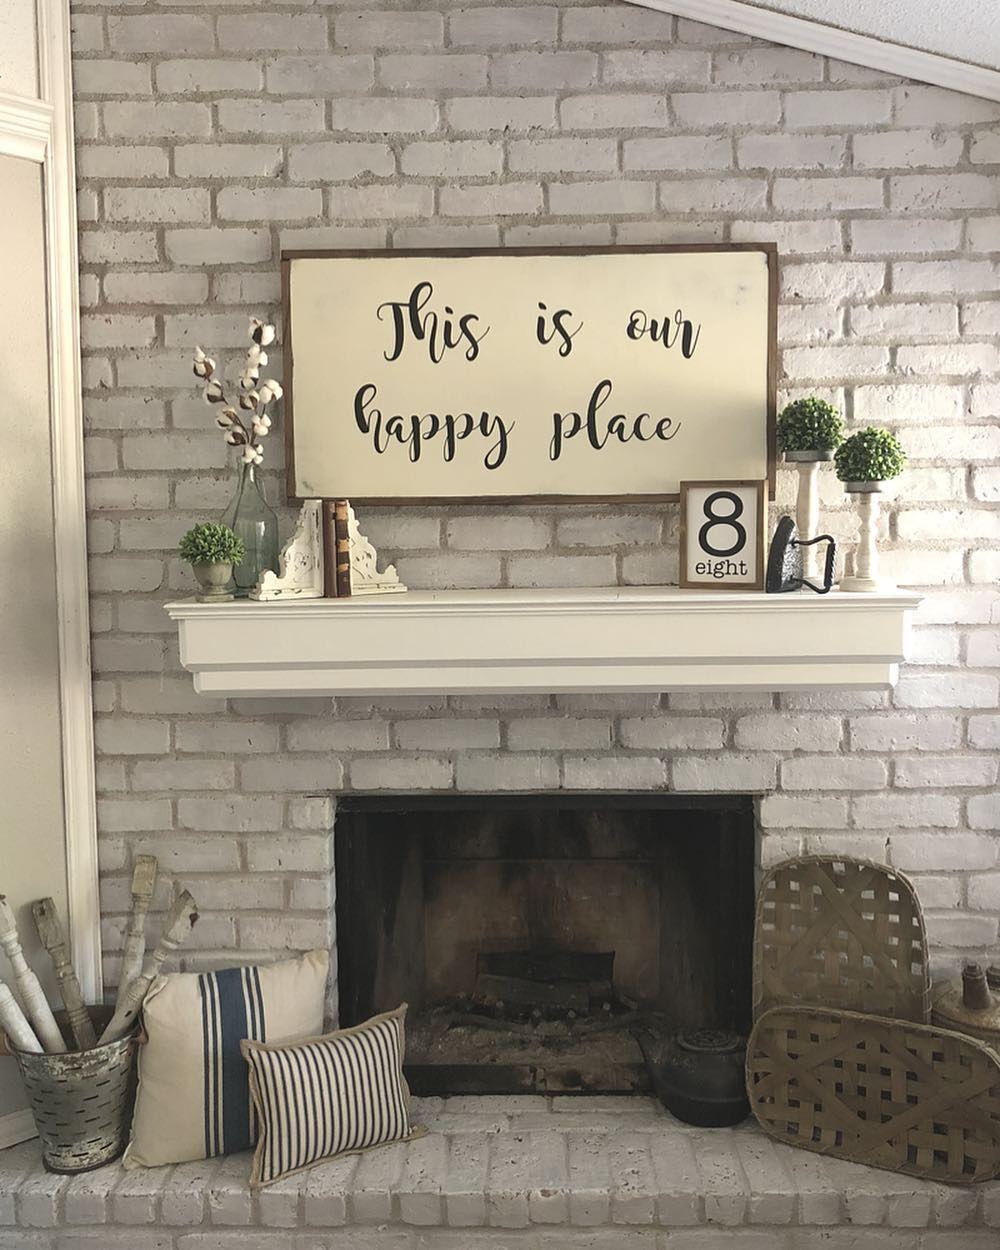 3 622 Likes 131 Comments Holly Our Faux Farmhouse Ourfauxfarmhouse On Instagram Hi Farmhouse Mantle Decor Above Fireplace Decor Rustic Mantle Decor